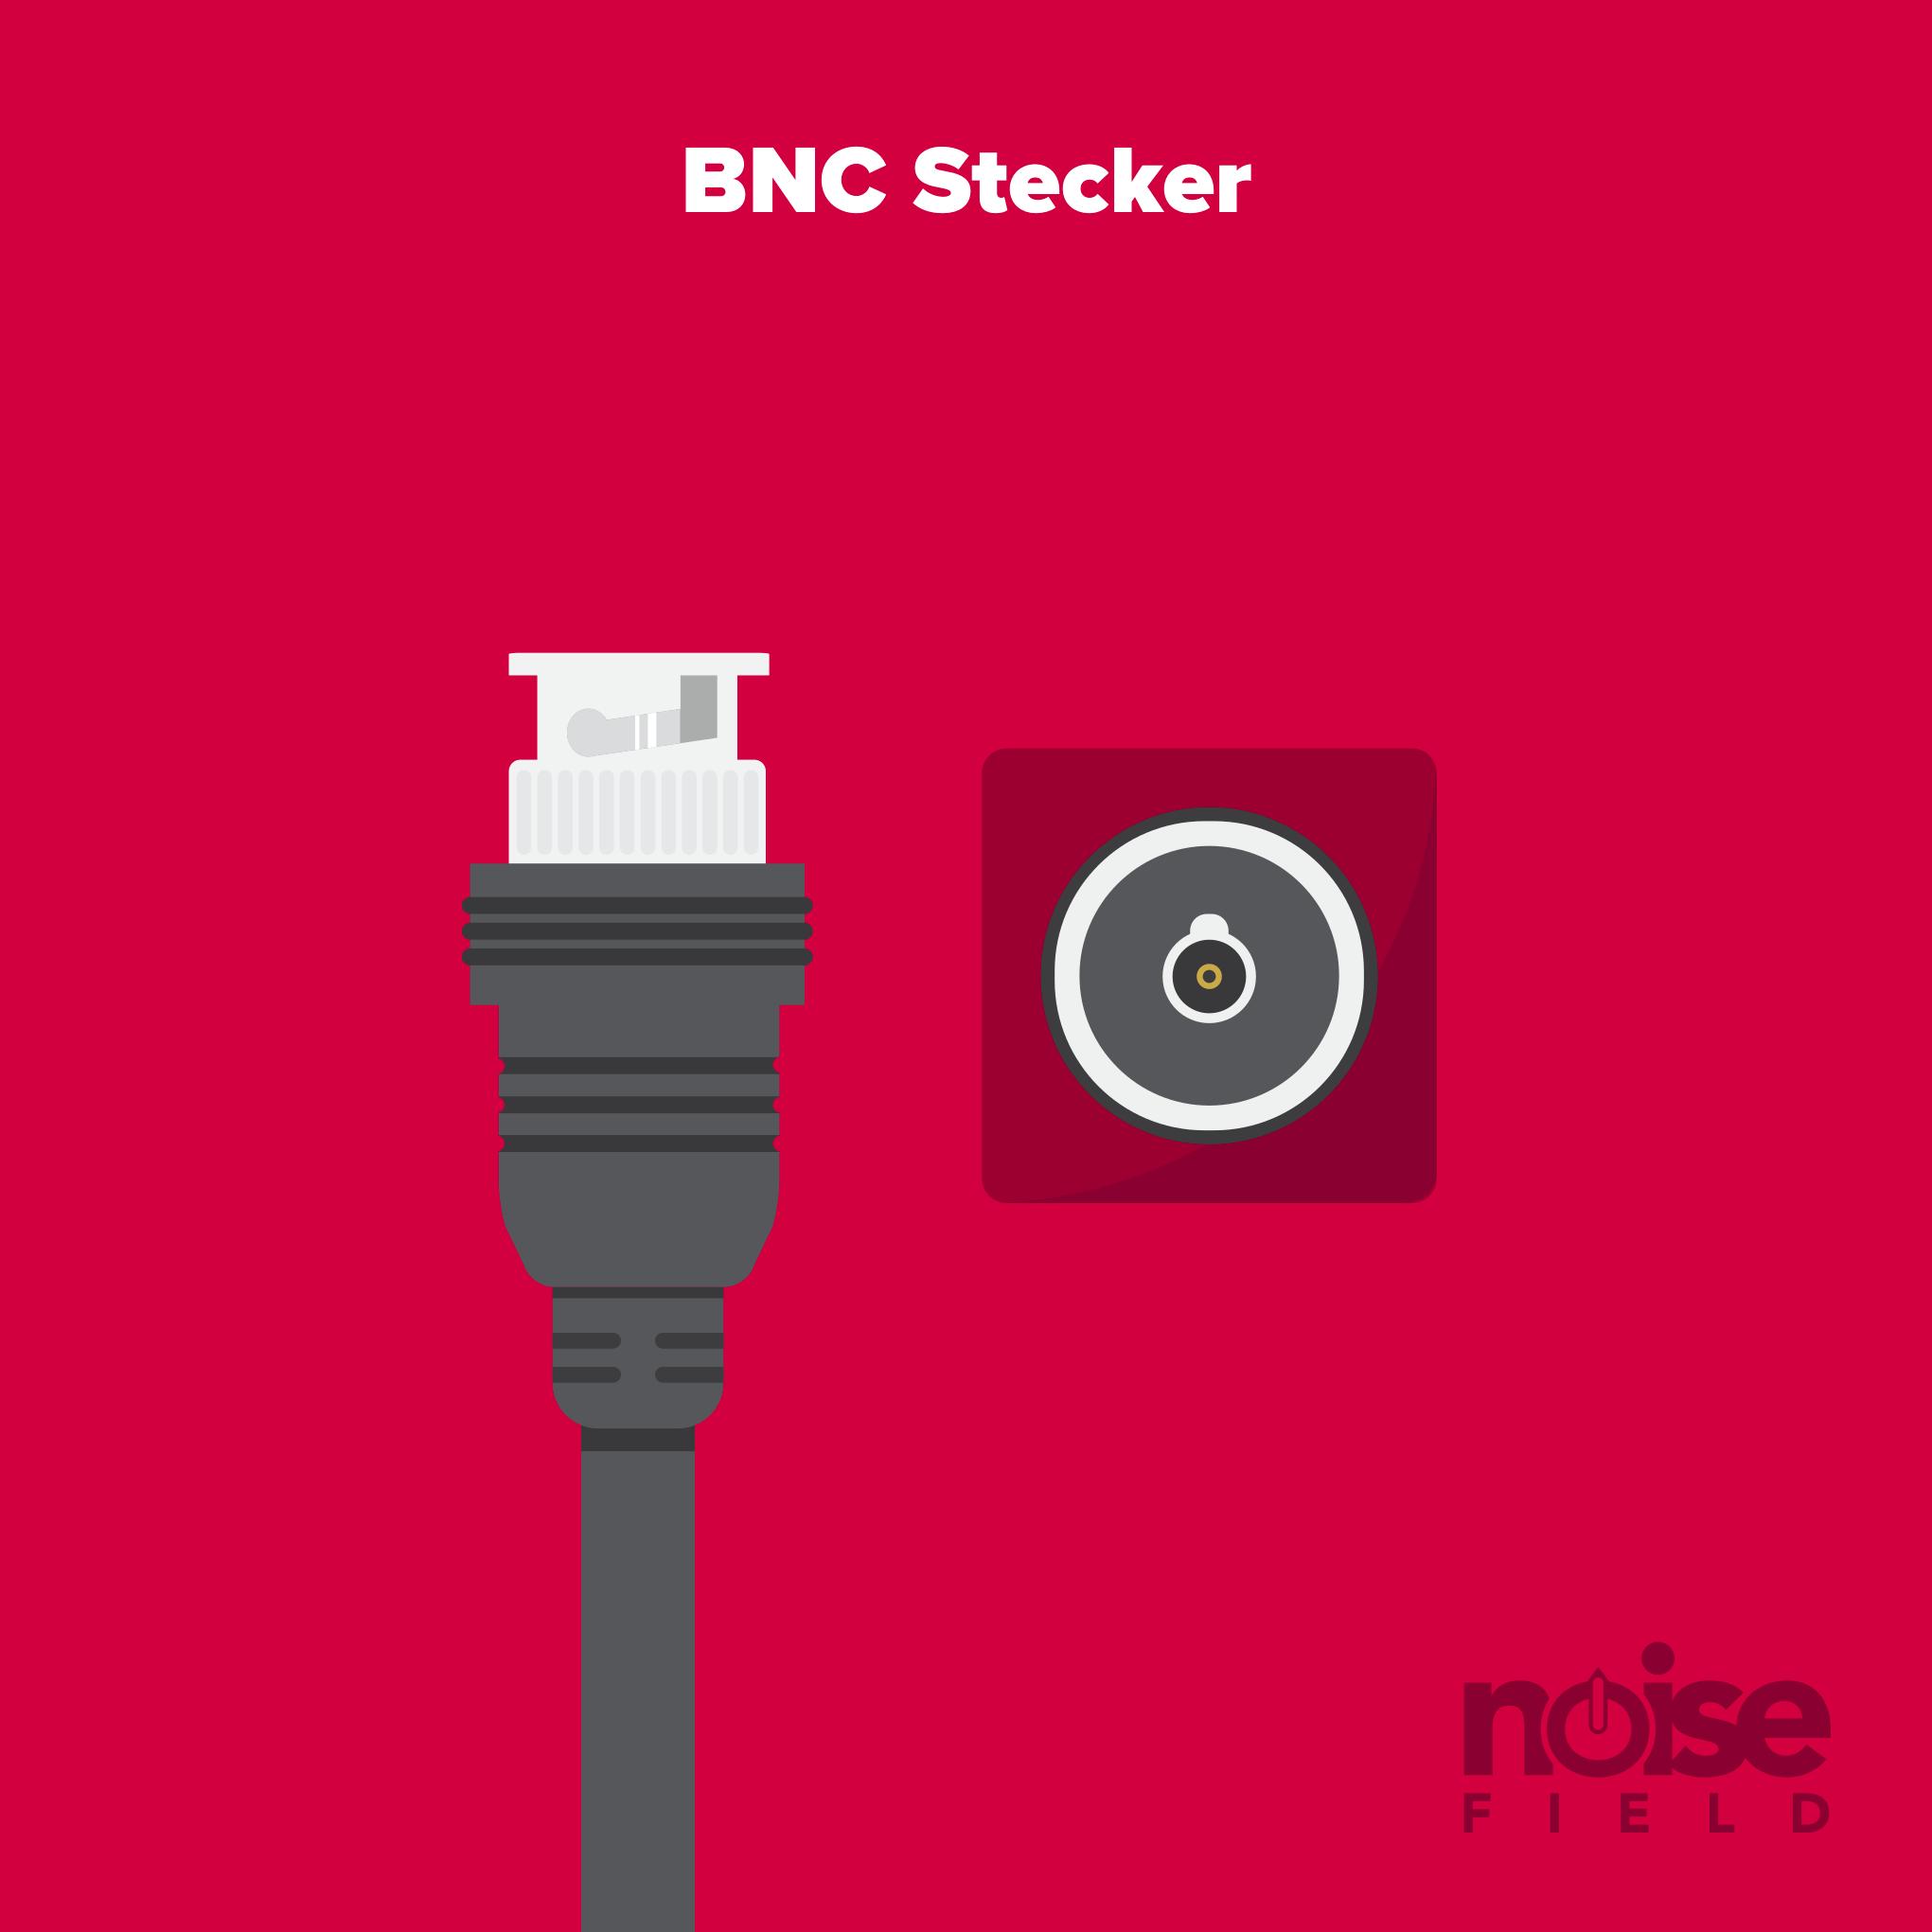 BNC Worldclock Stecker Buchse Illustration Vector Audio Interface